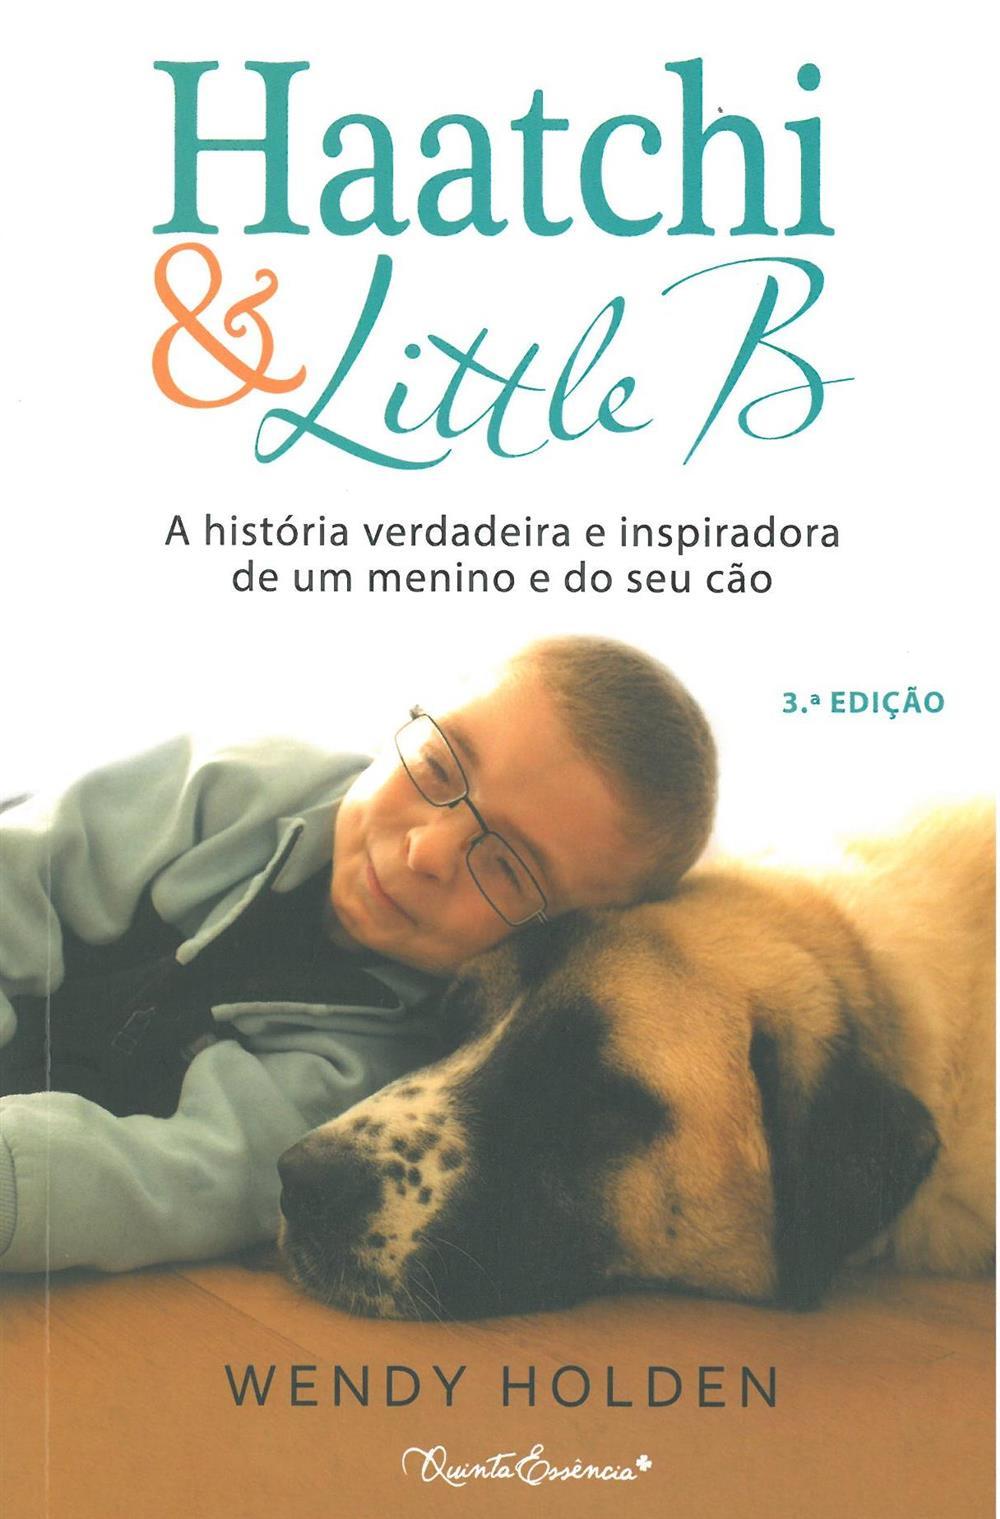 Haatchi & Little B_.jpg